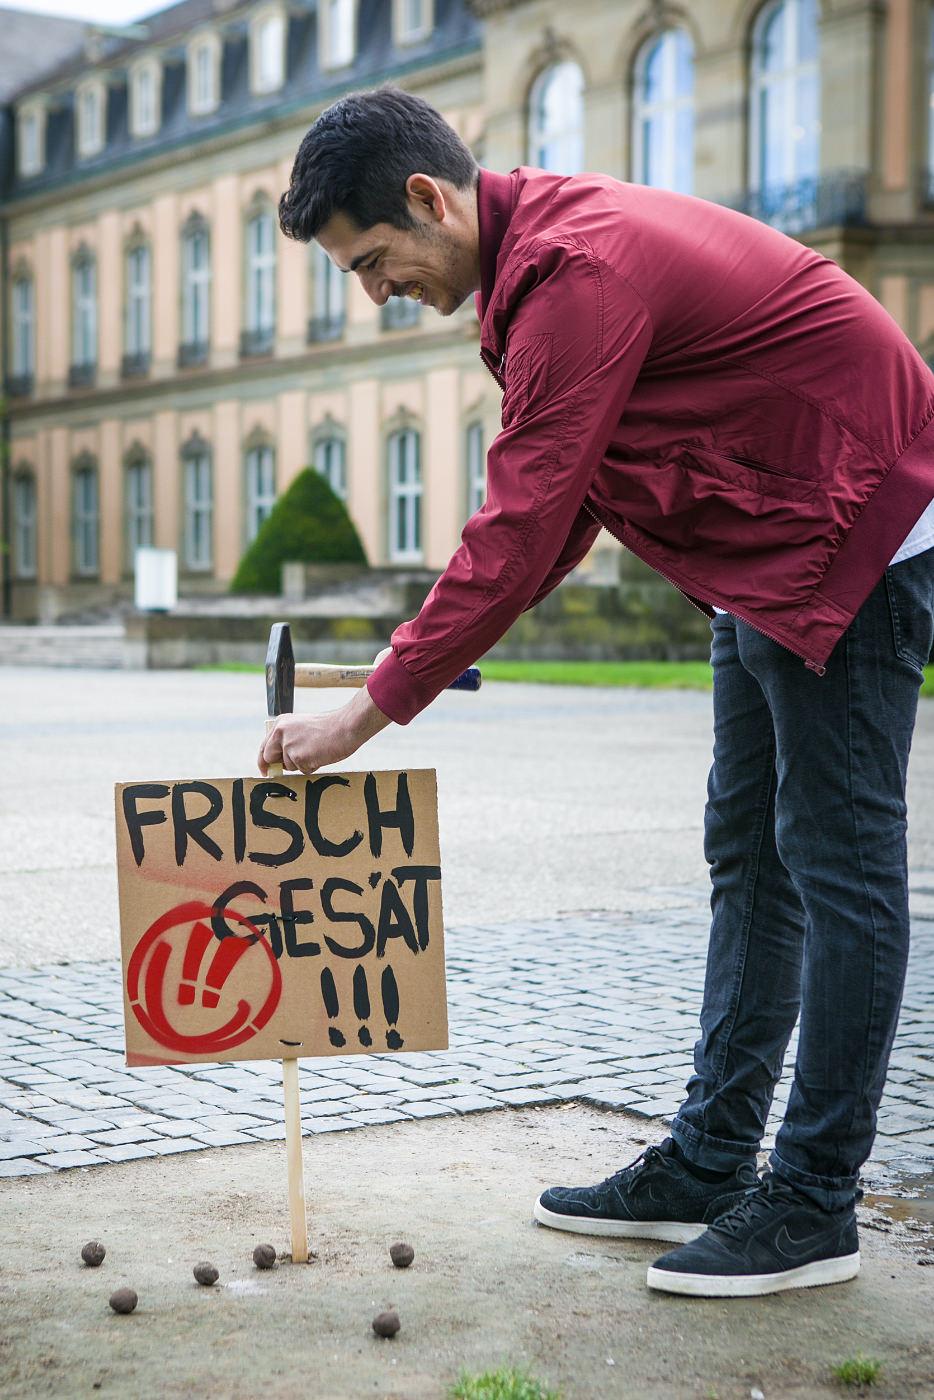 Frisch Gesät Rivella Aktion Stuttgart